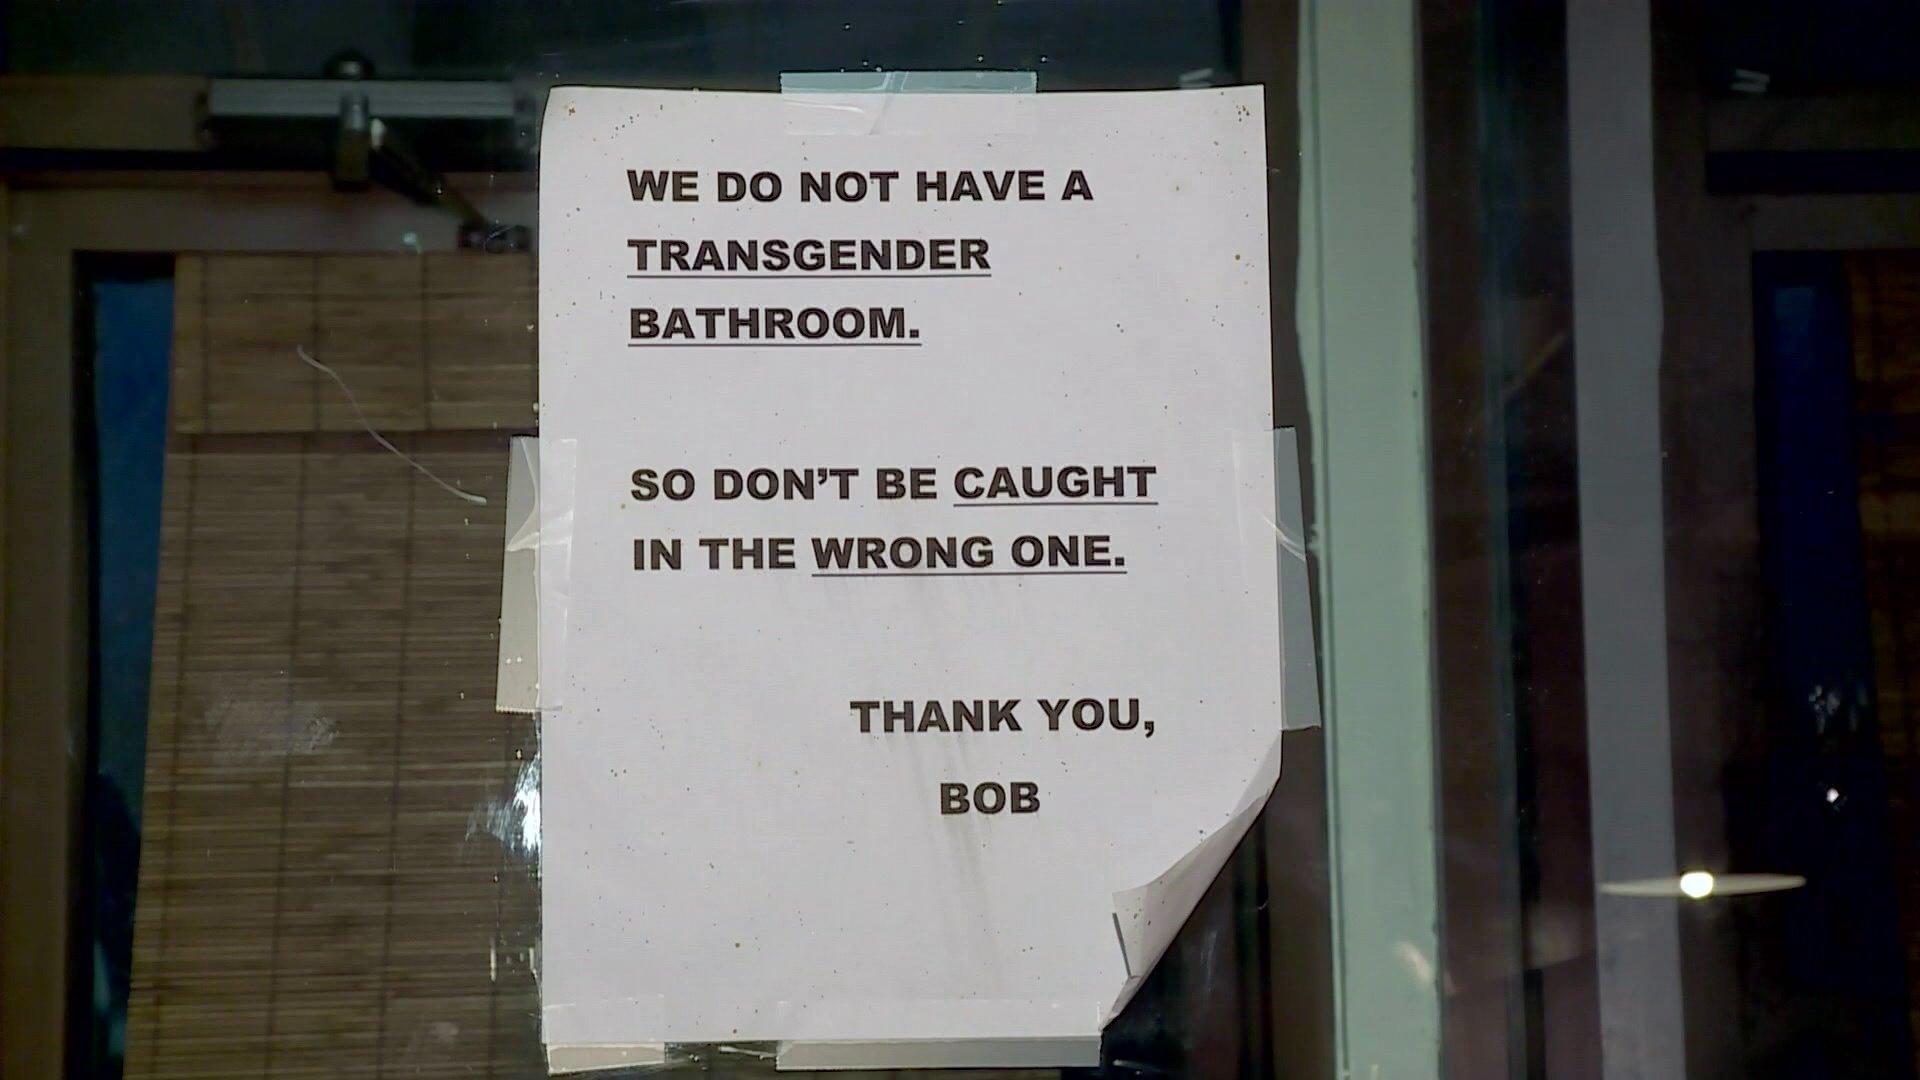 Oklahoma city restaurant 39 s transgender bathroom sign sparks controversy aol news for Transgender bathroom debate article